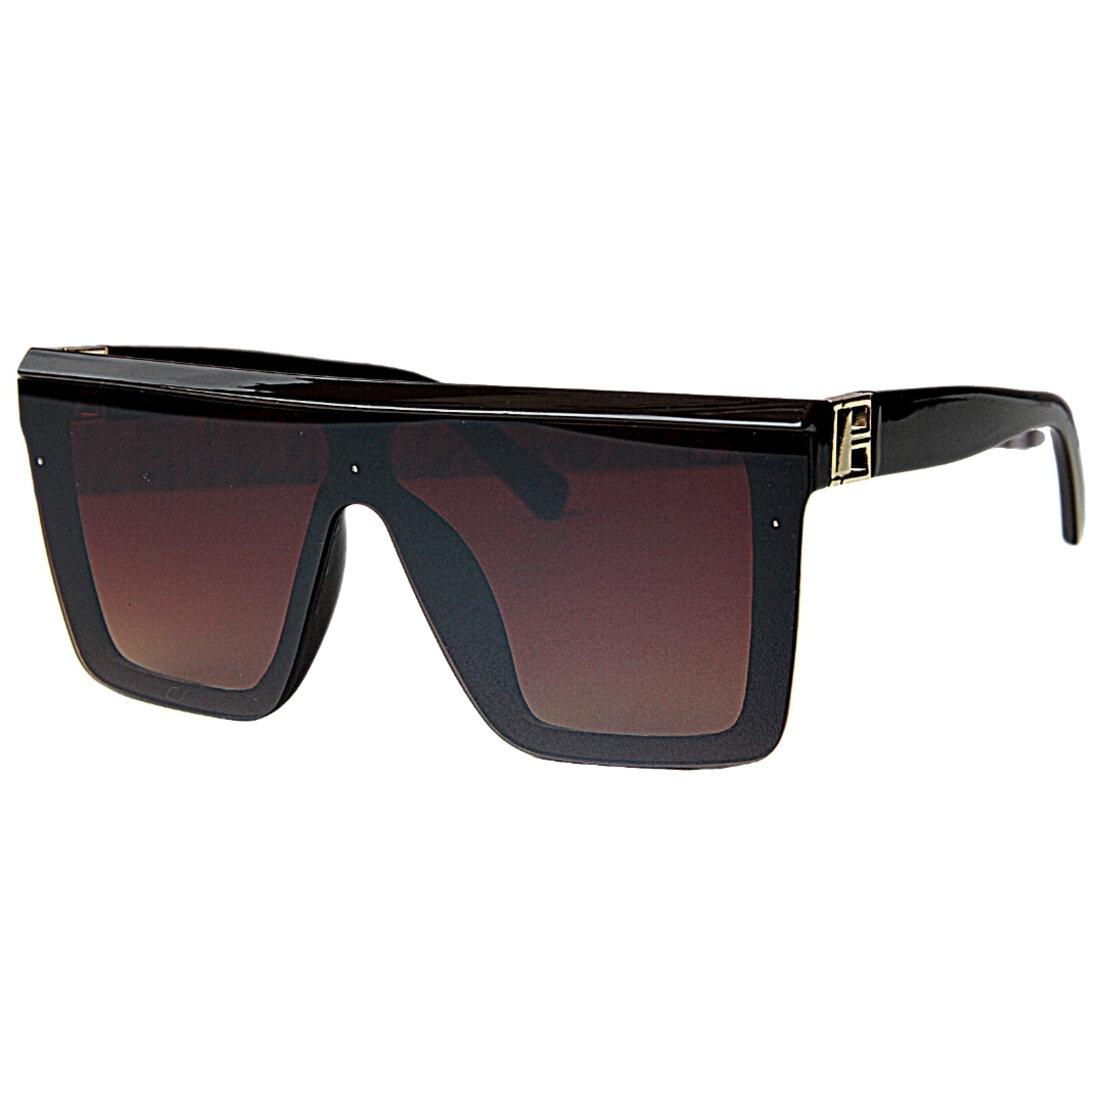 Óculos de Sol Khatto Square Daphne Fashion - C130